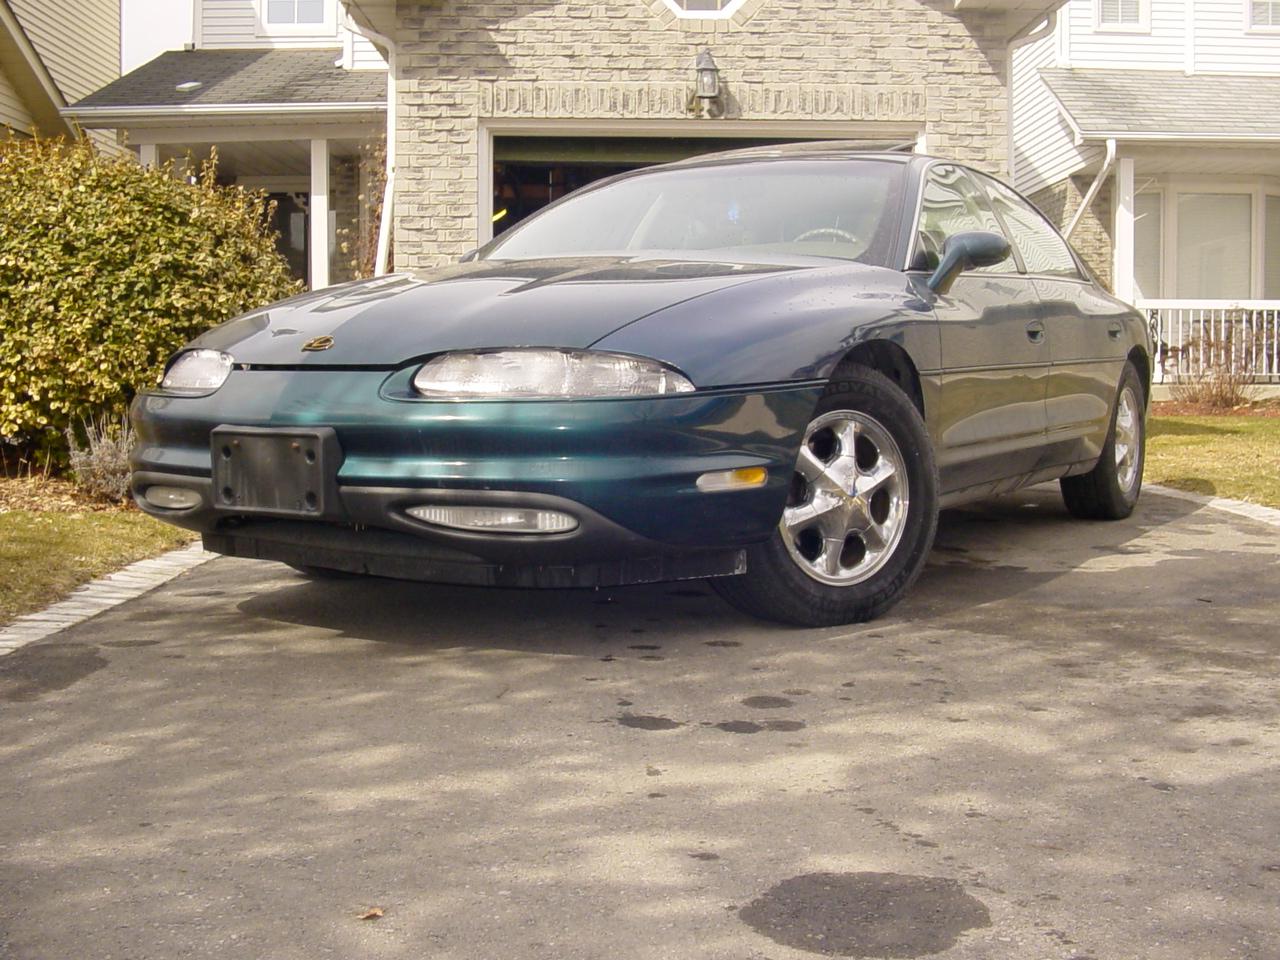 File:Oldsmobile Aurora 1998.jpg - Wikipedia, the free encyclopedia